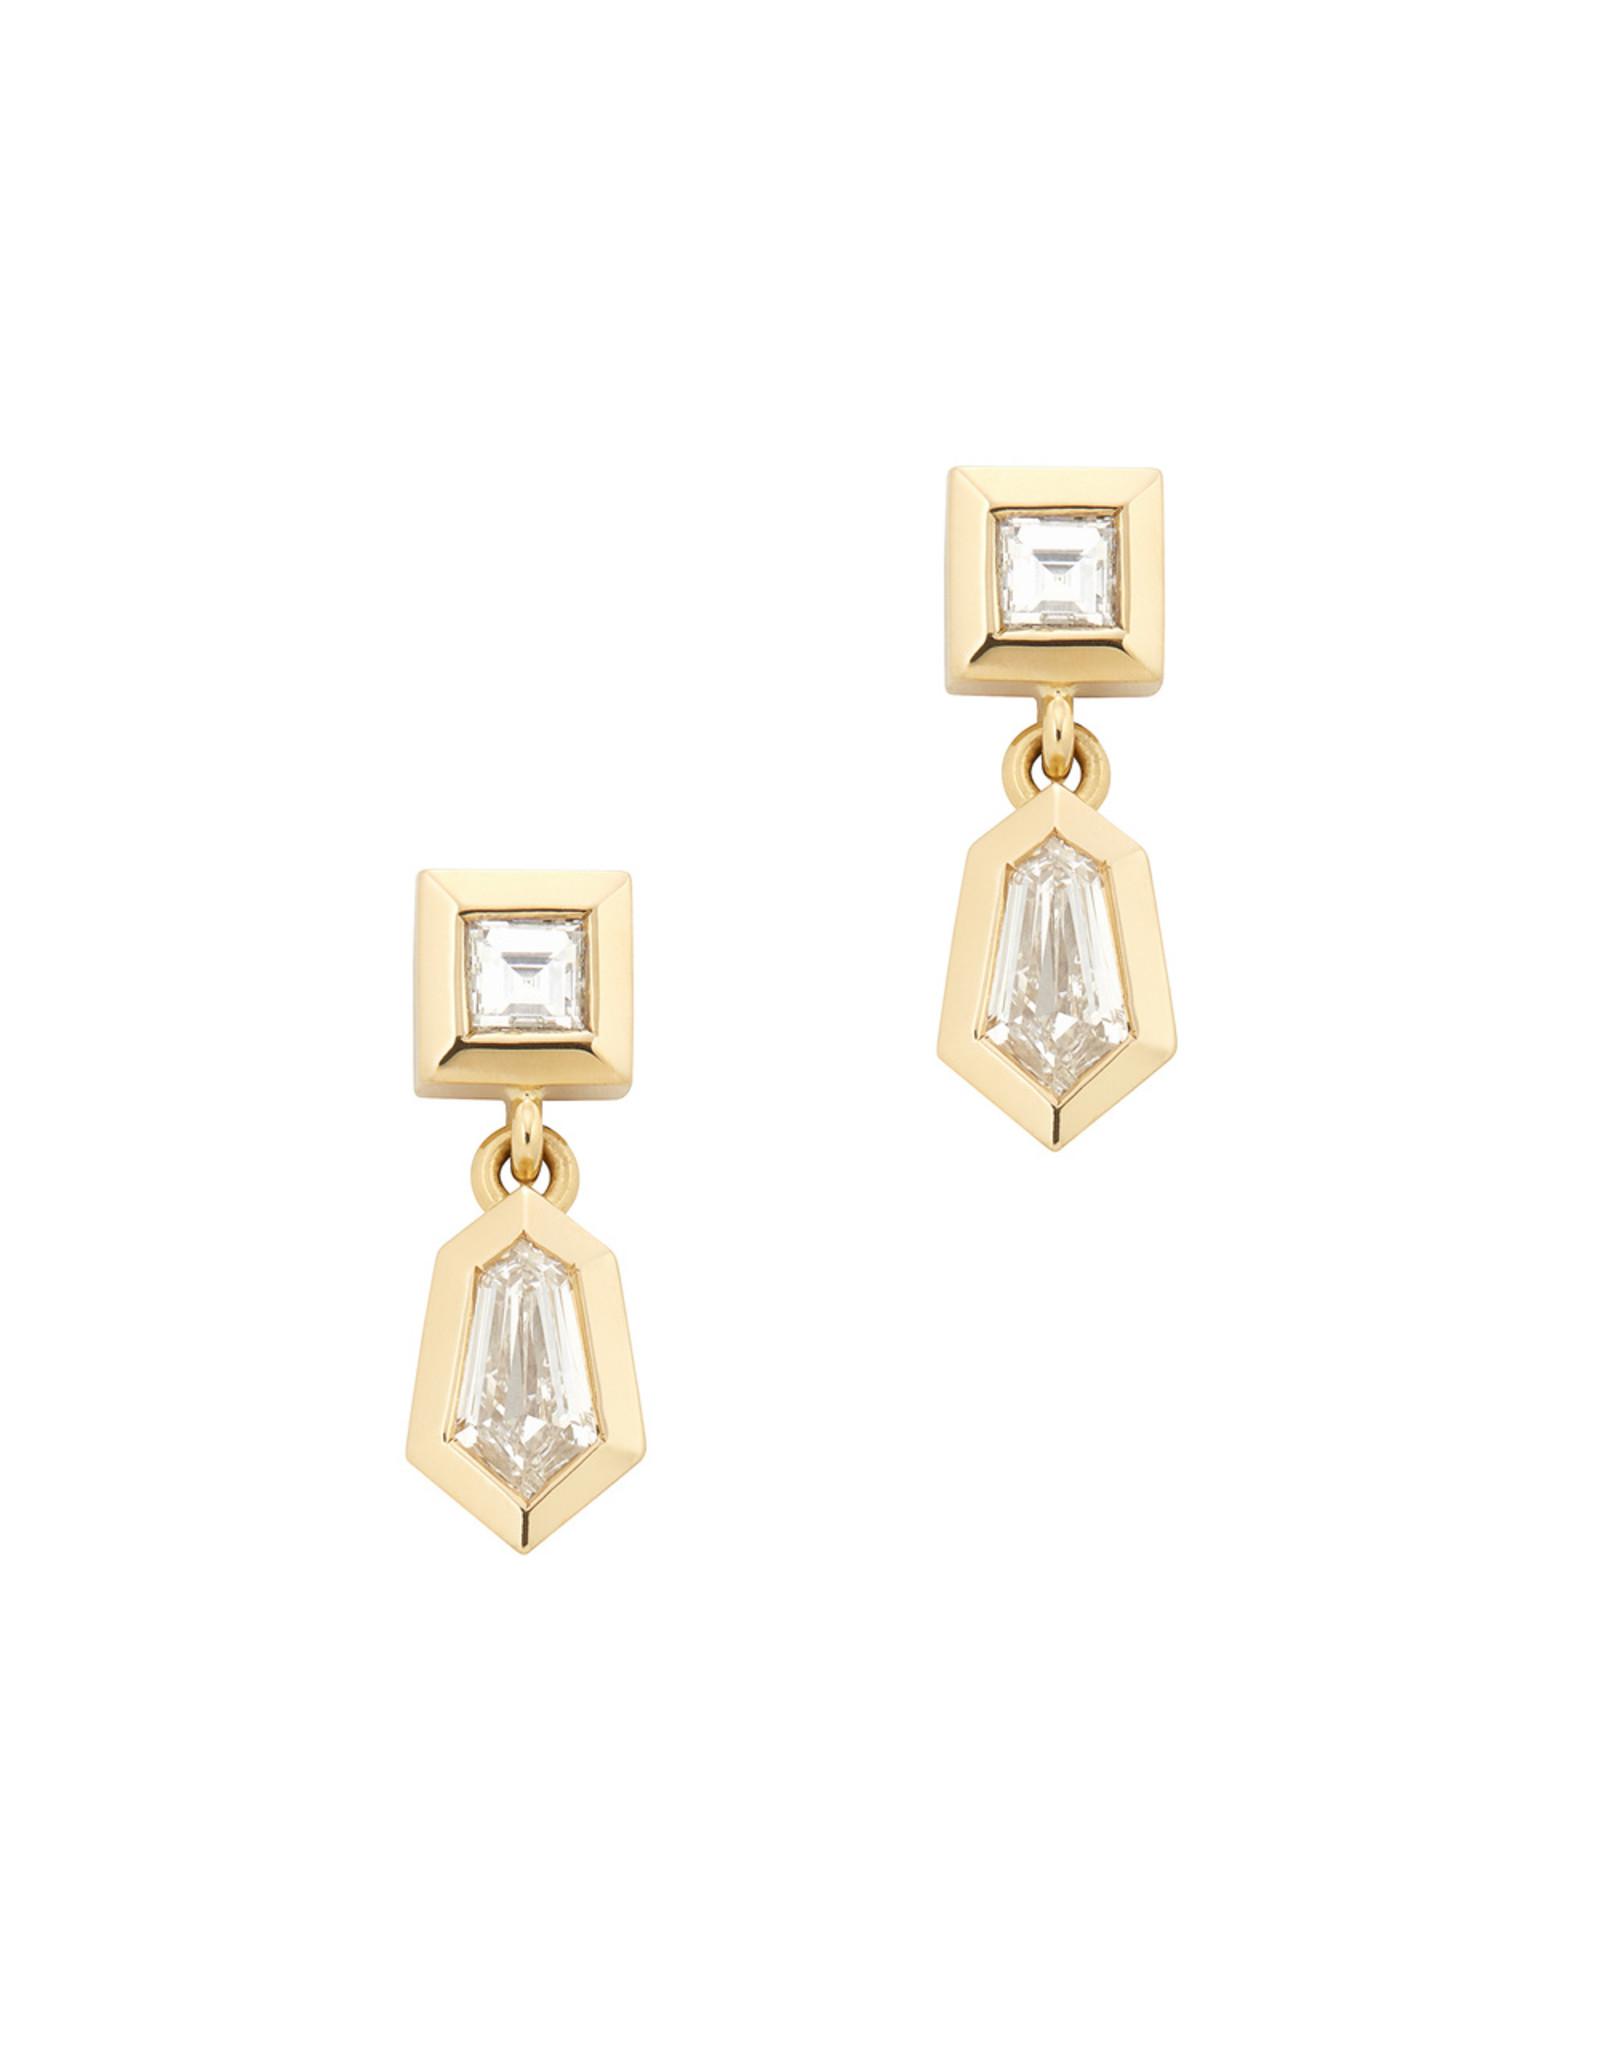 Azlee Azlee Dangle Rare Cut Earrings - Yellow Gold / White Diamond